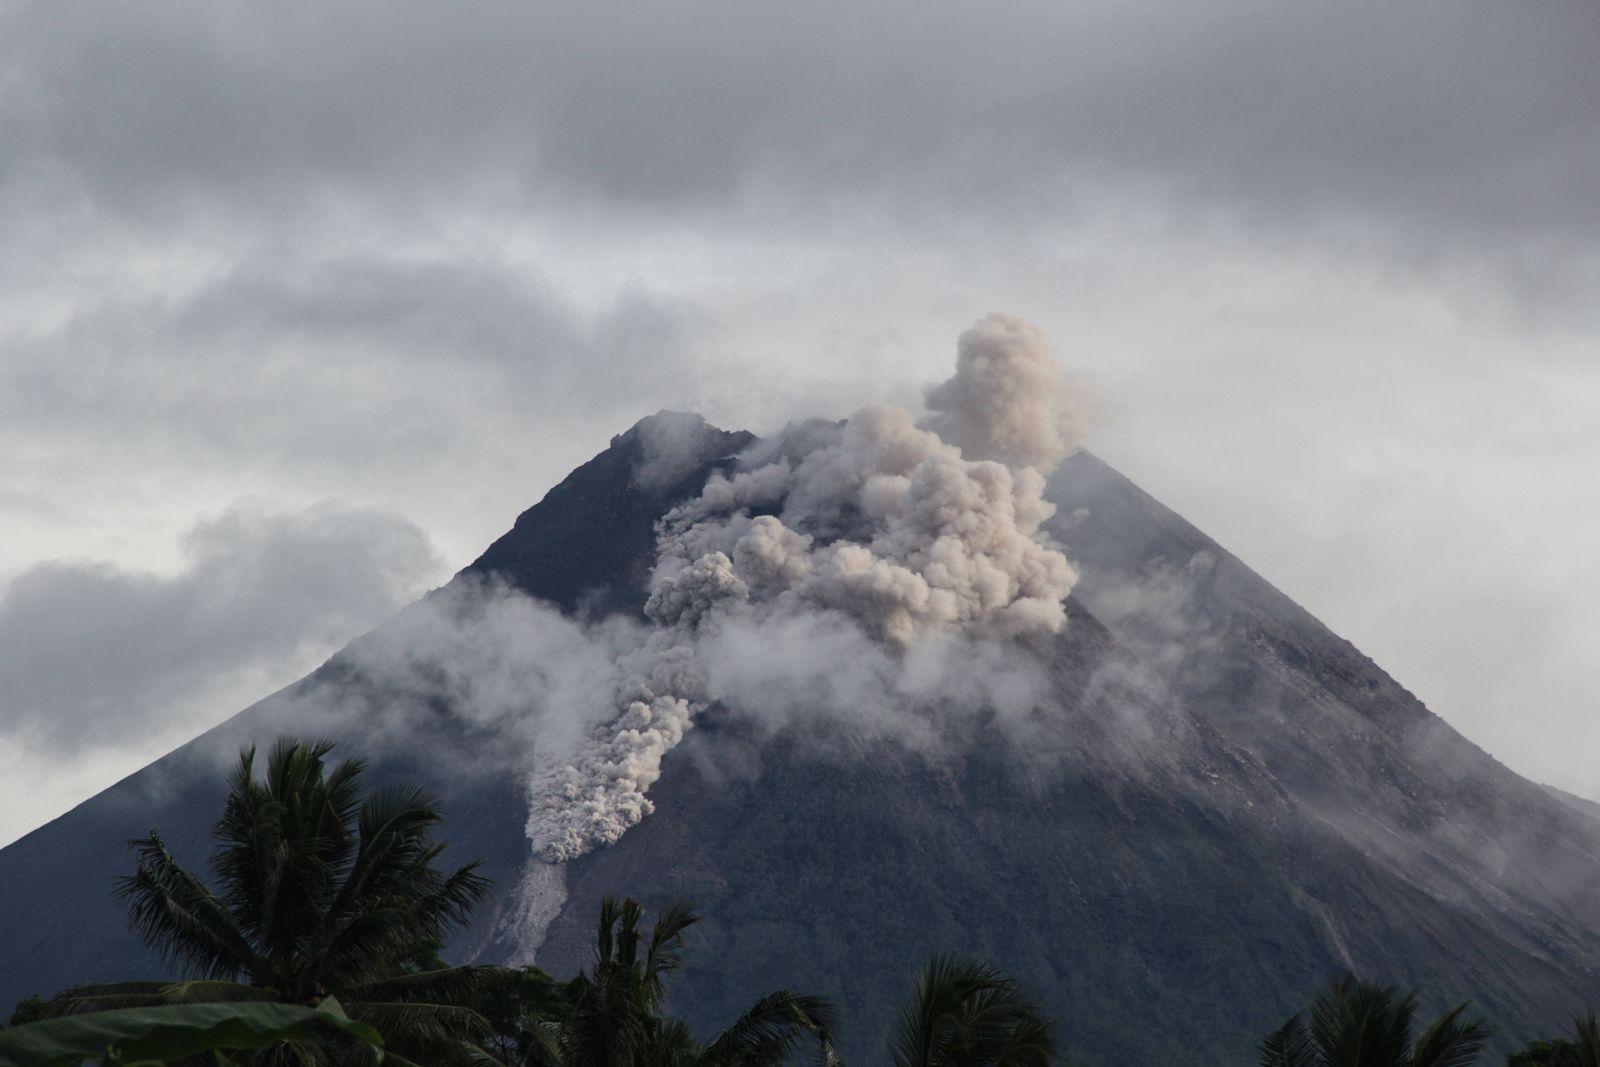 January 27, 2021, Sleman, YOGYAKARTA, INDONESIA: Mount Merapi in Sleman, Yogyakarta, Indonesia, released a large hot cl